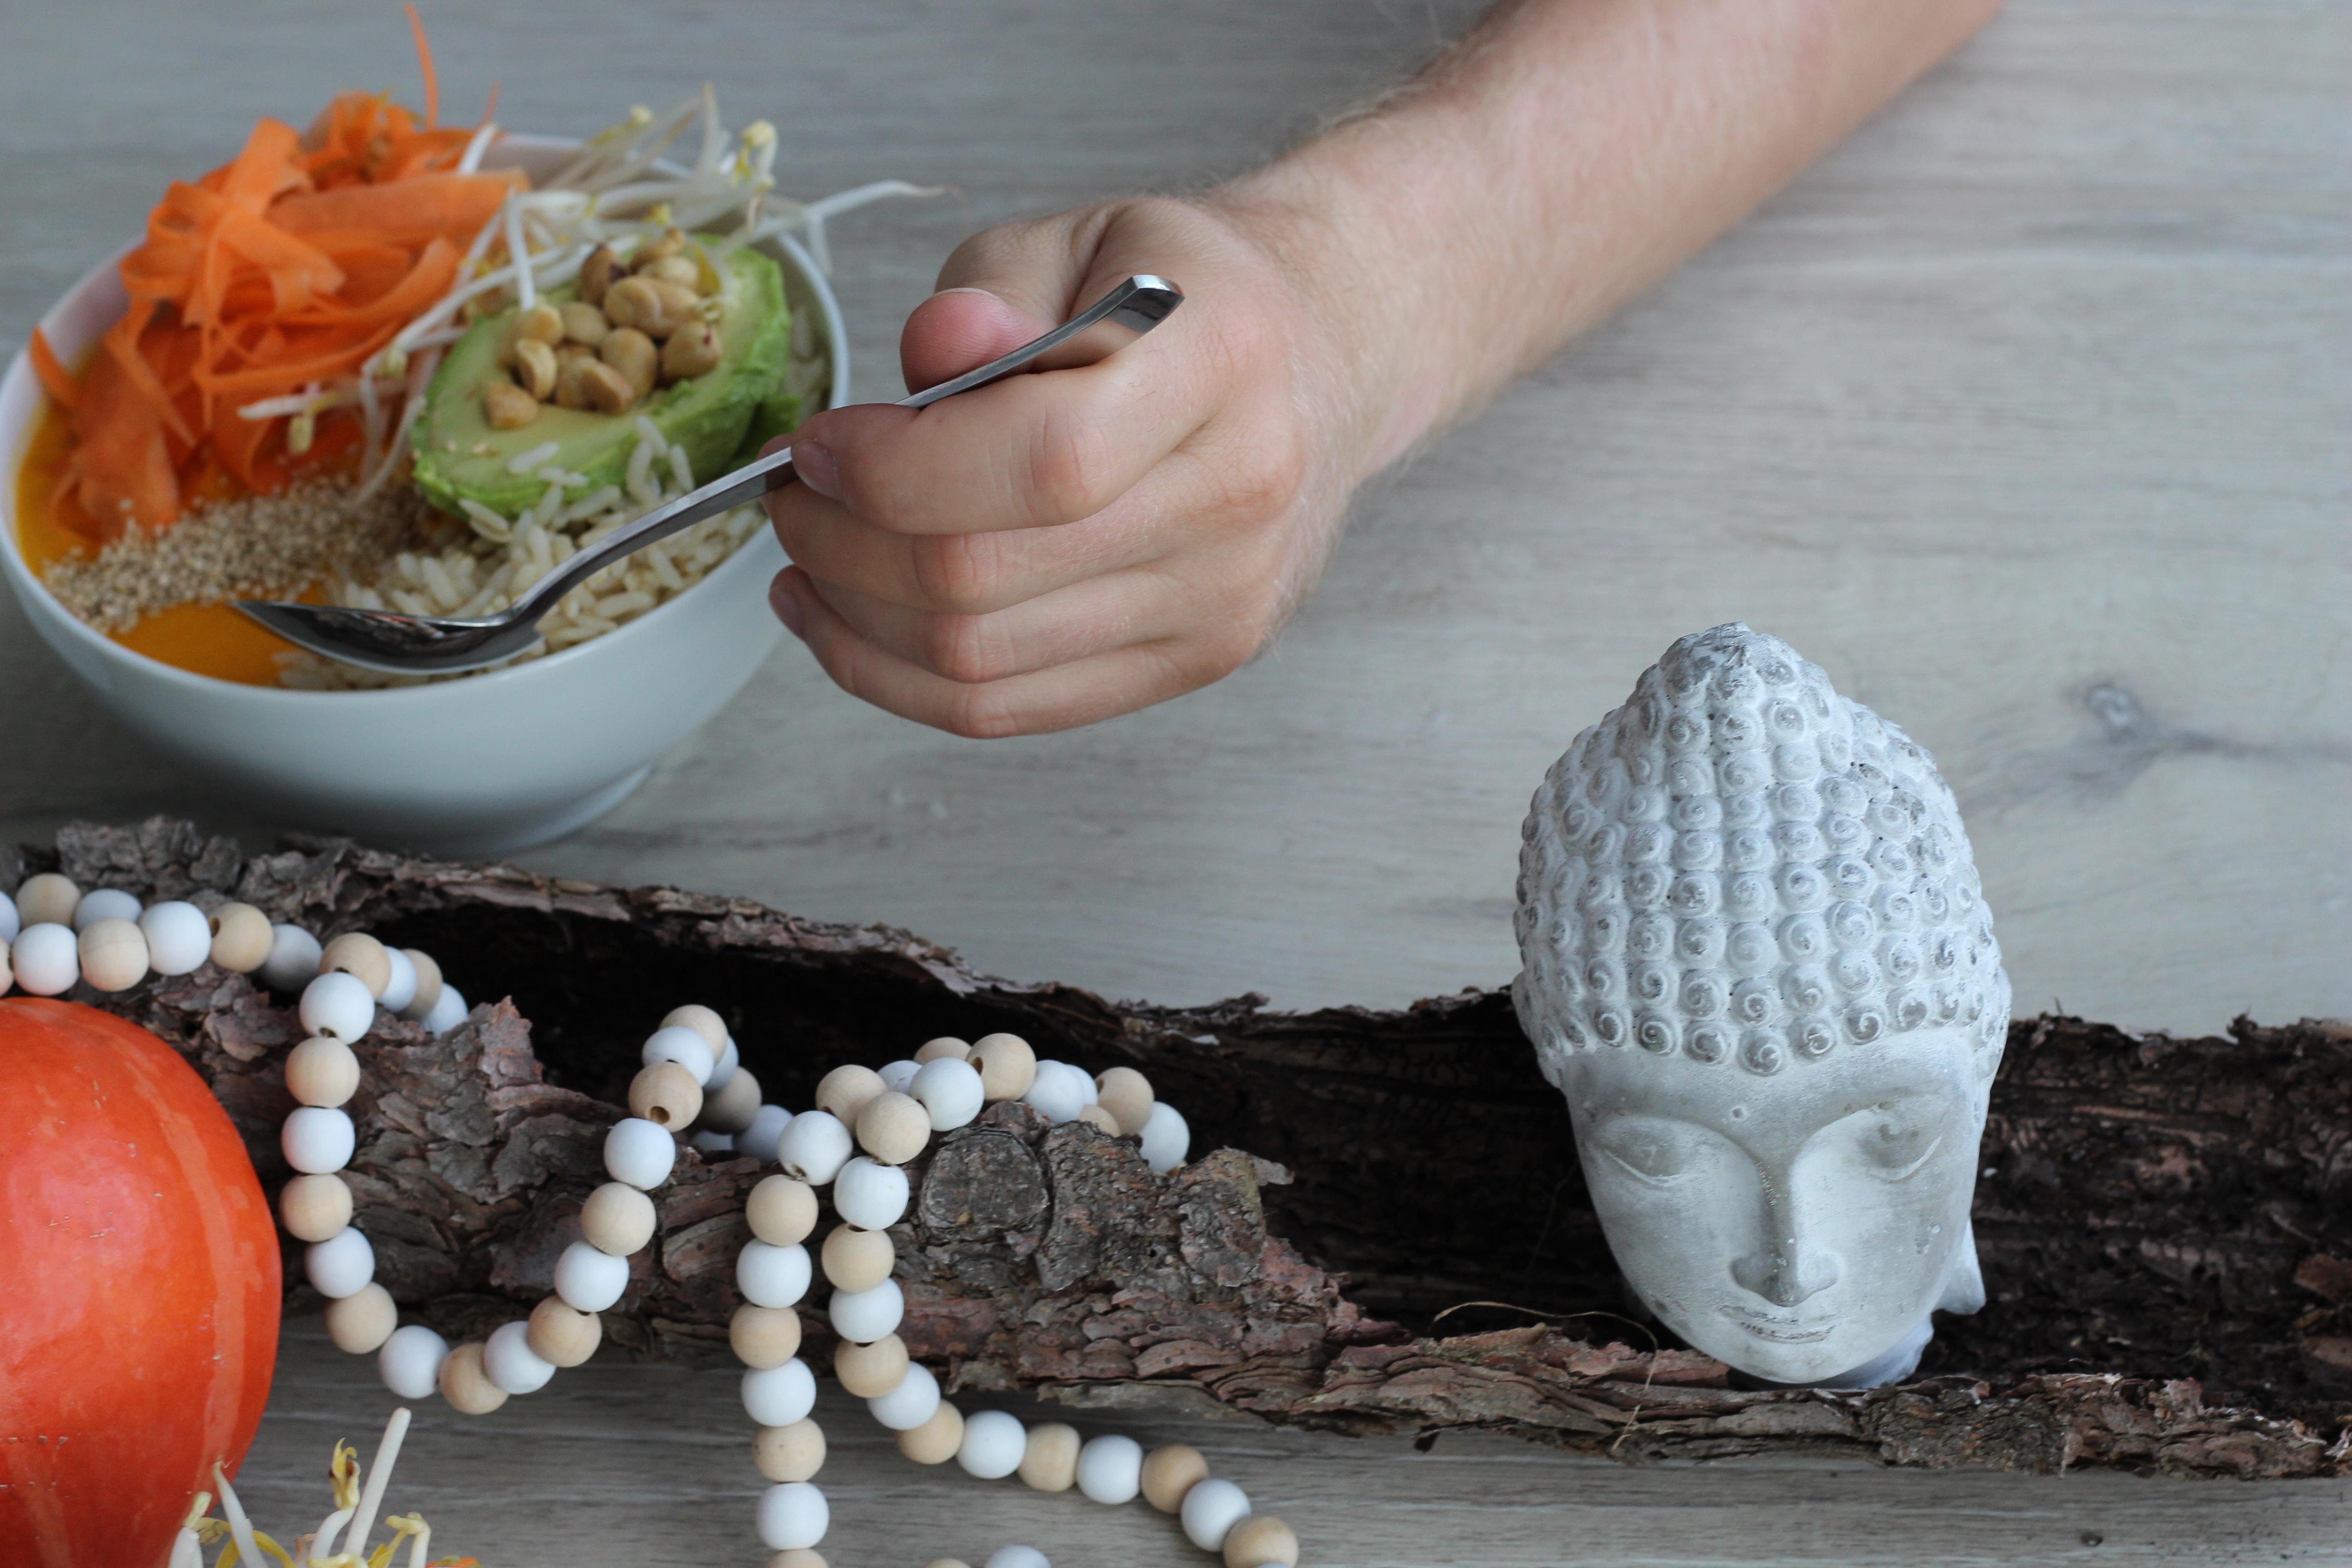 buddha-bowl-dein-homespa-ingwer-kuerbis-sauce